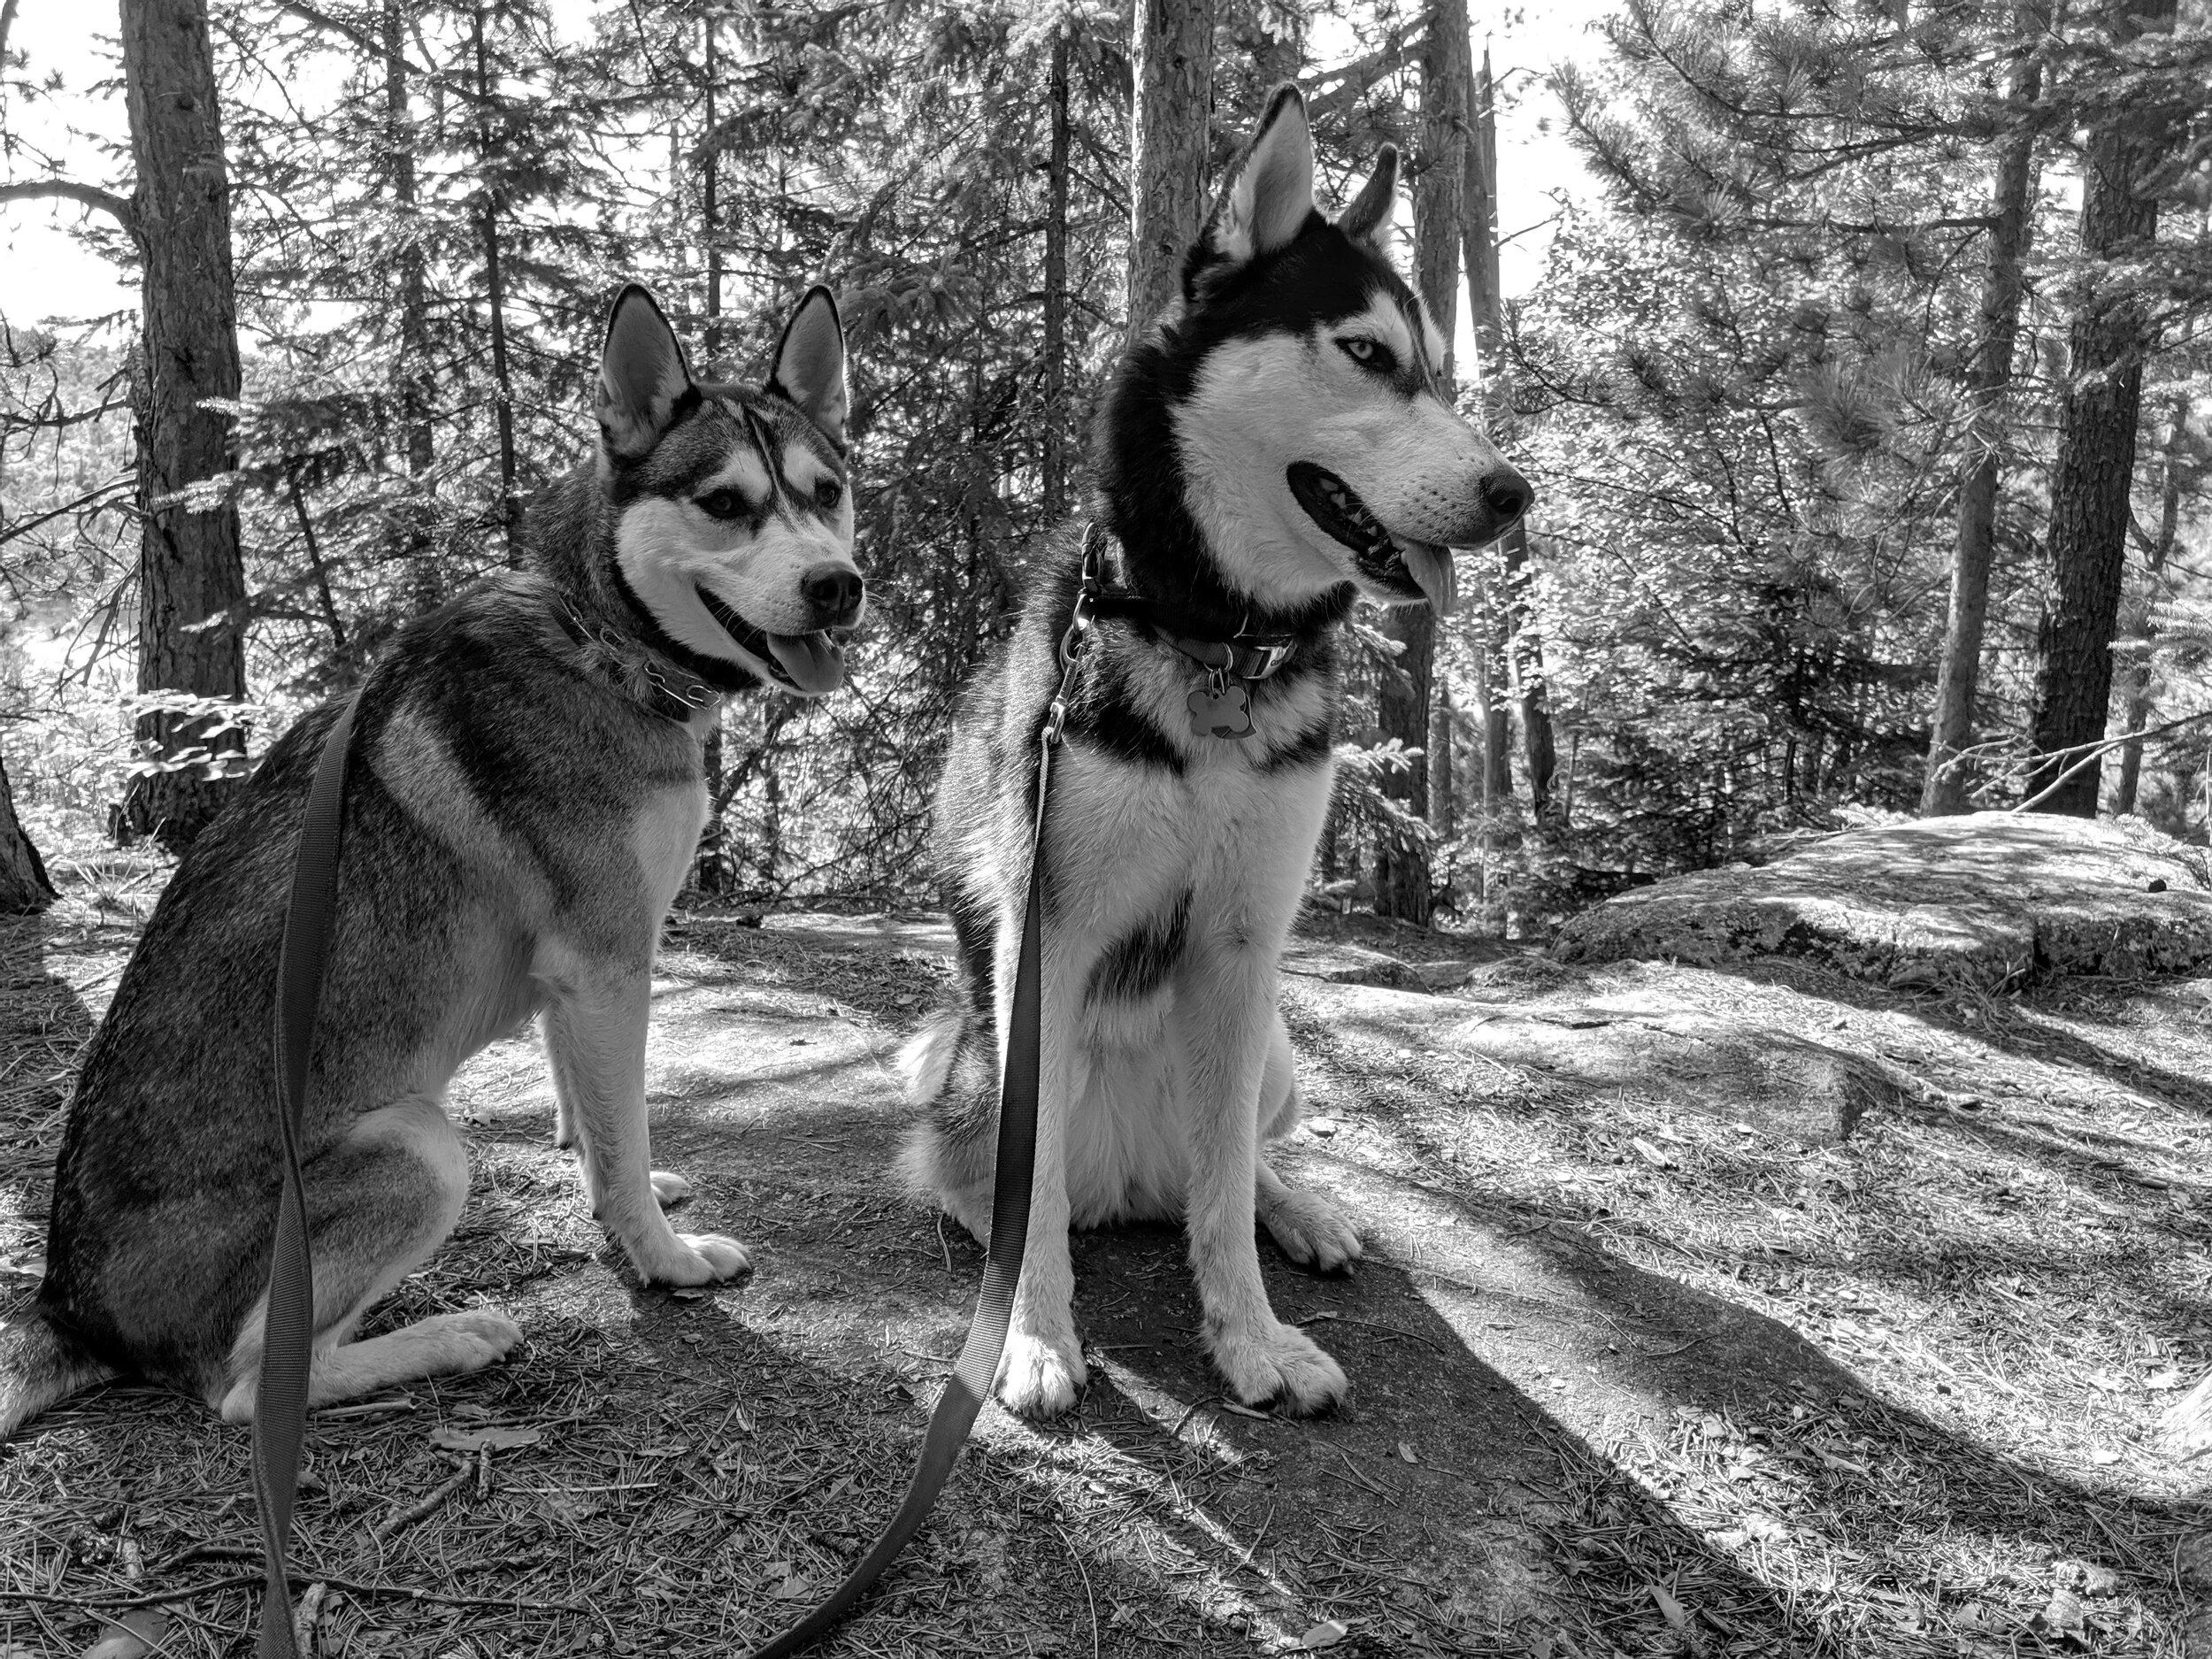 SiberianSoapCo-Tundra&Taiga